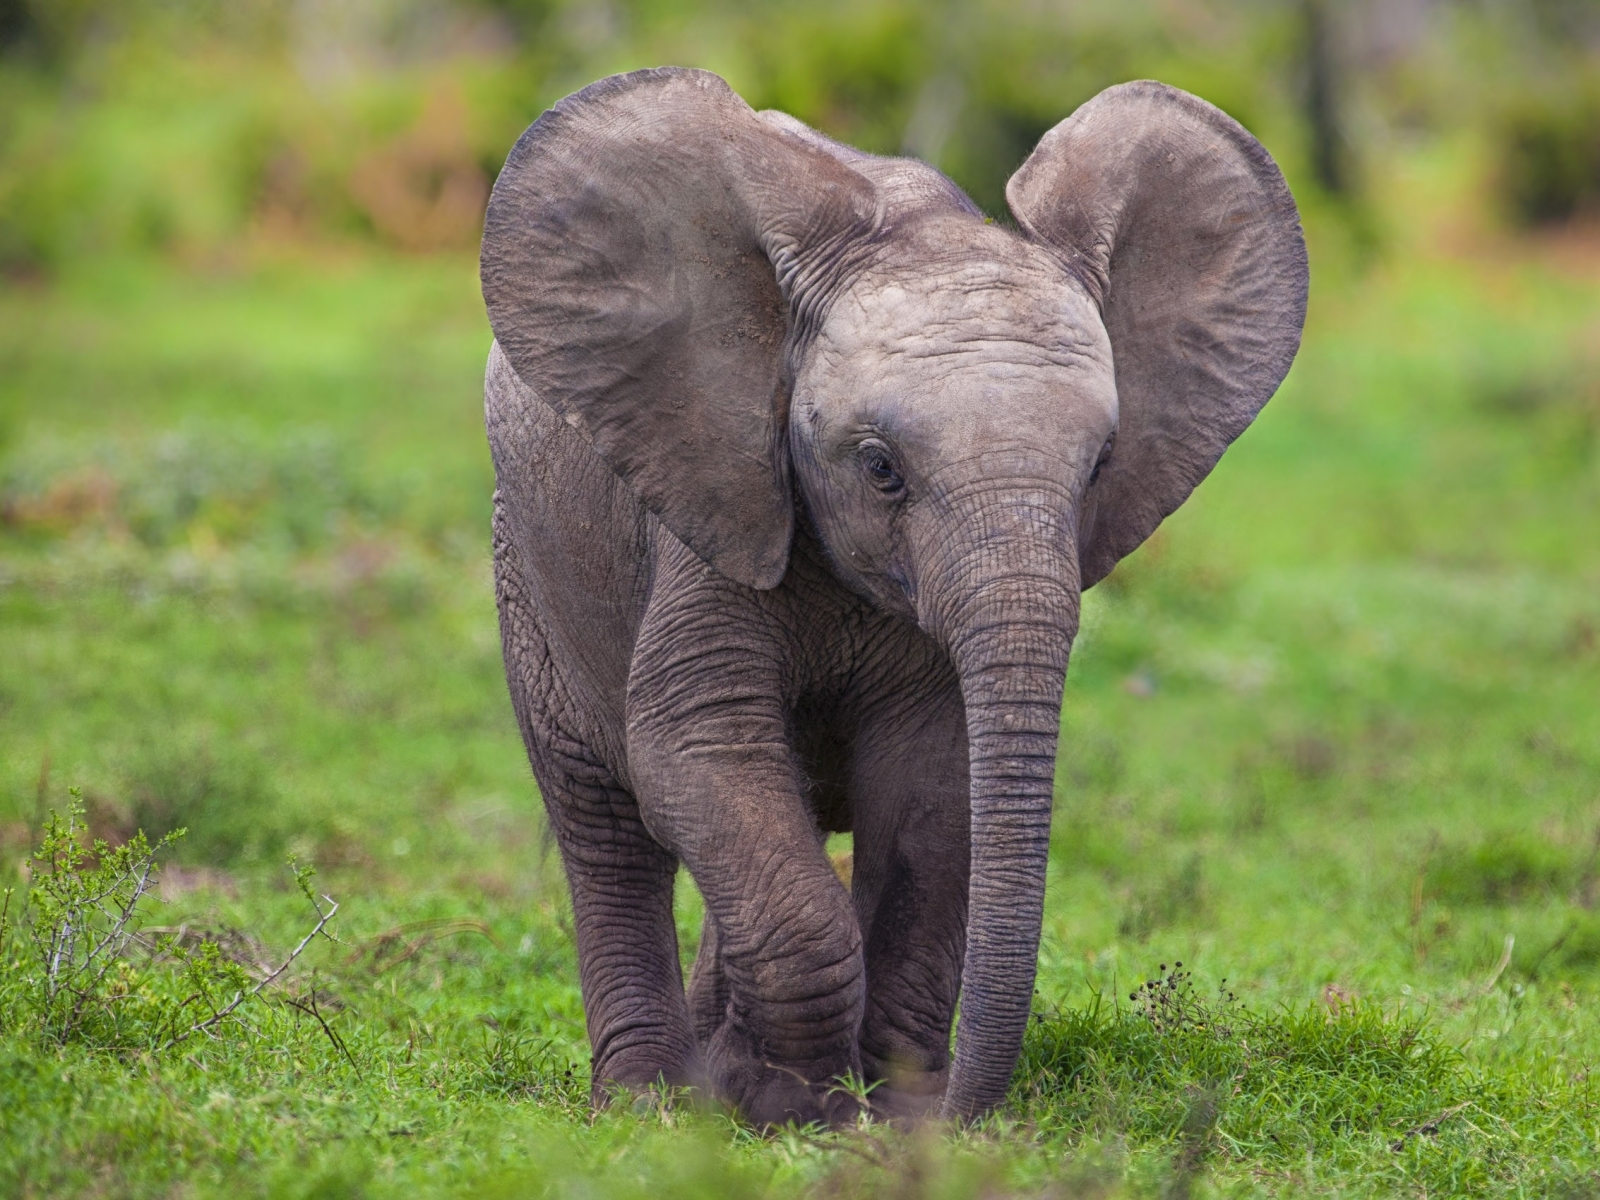 Wallpaper download elephant - Download Animals Chrome Elephants Baby Elephant Safari Wallpaper